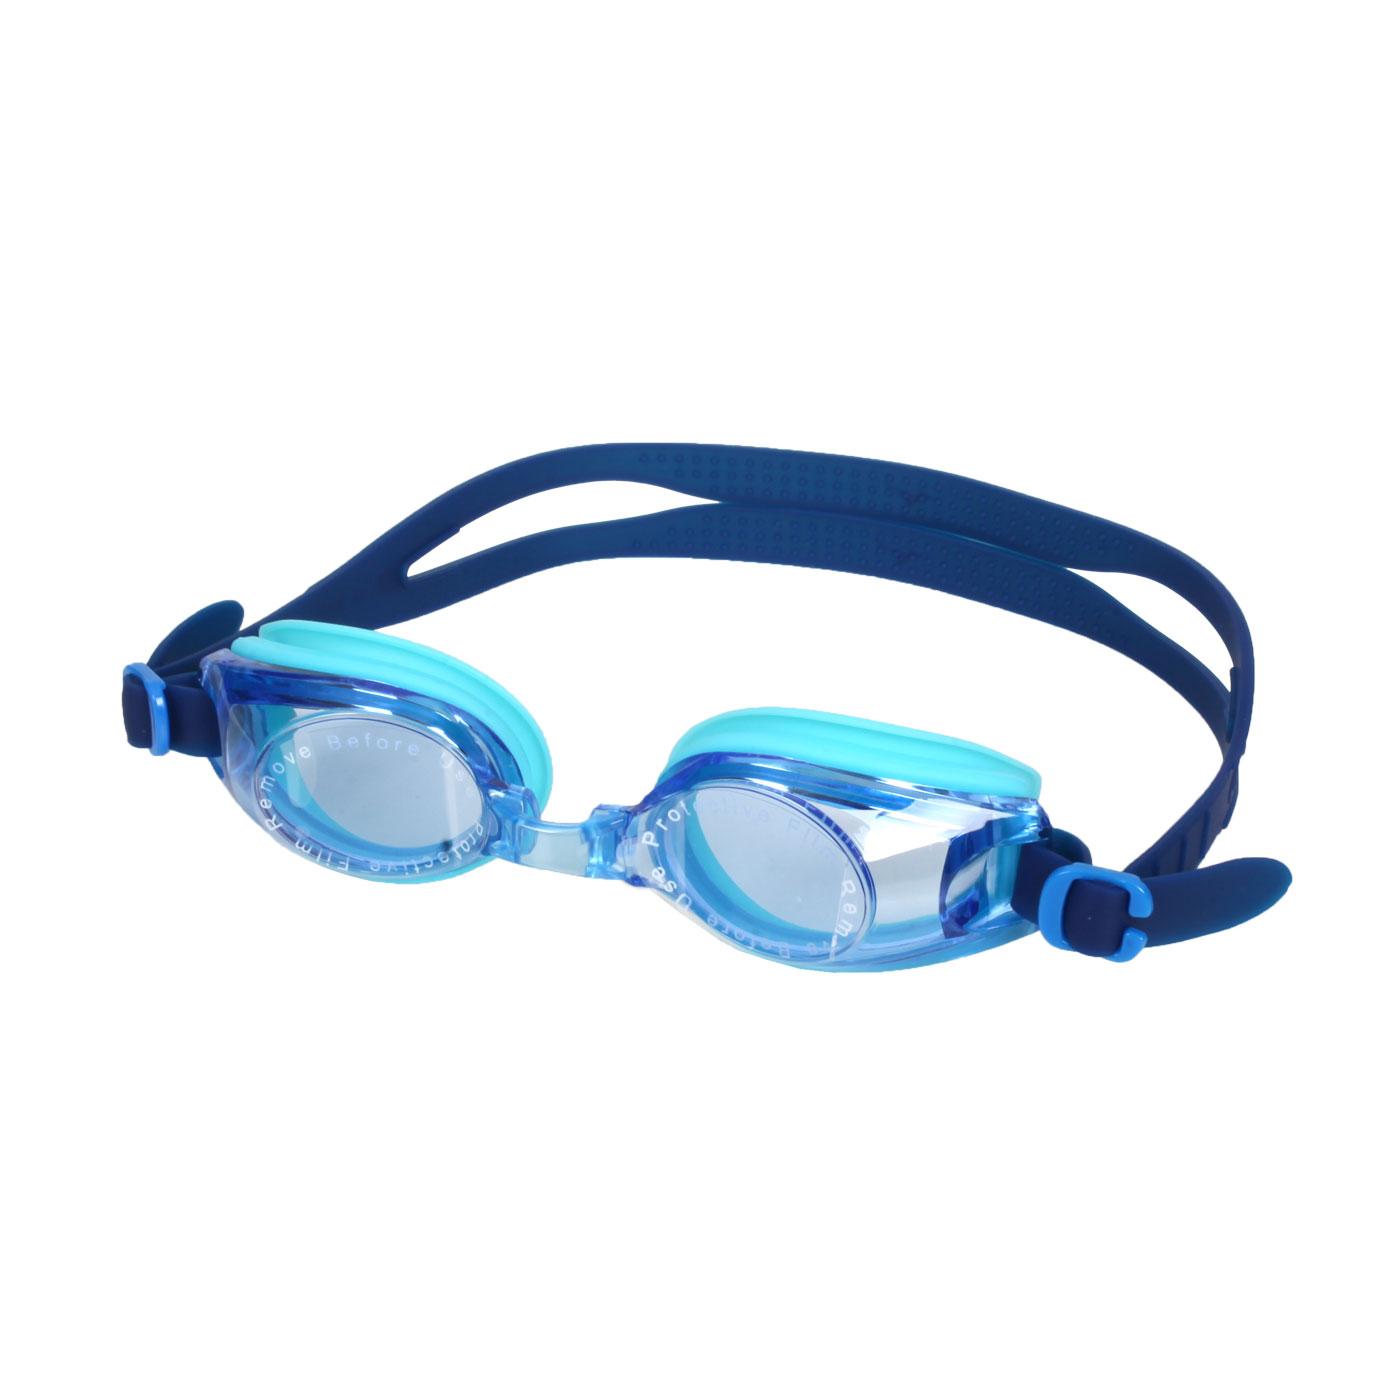 MIZUNO 兒童泳鏡  SWIMN3TF059500-22 - 水藍綠